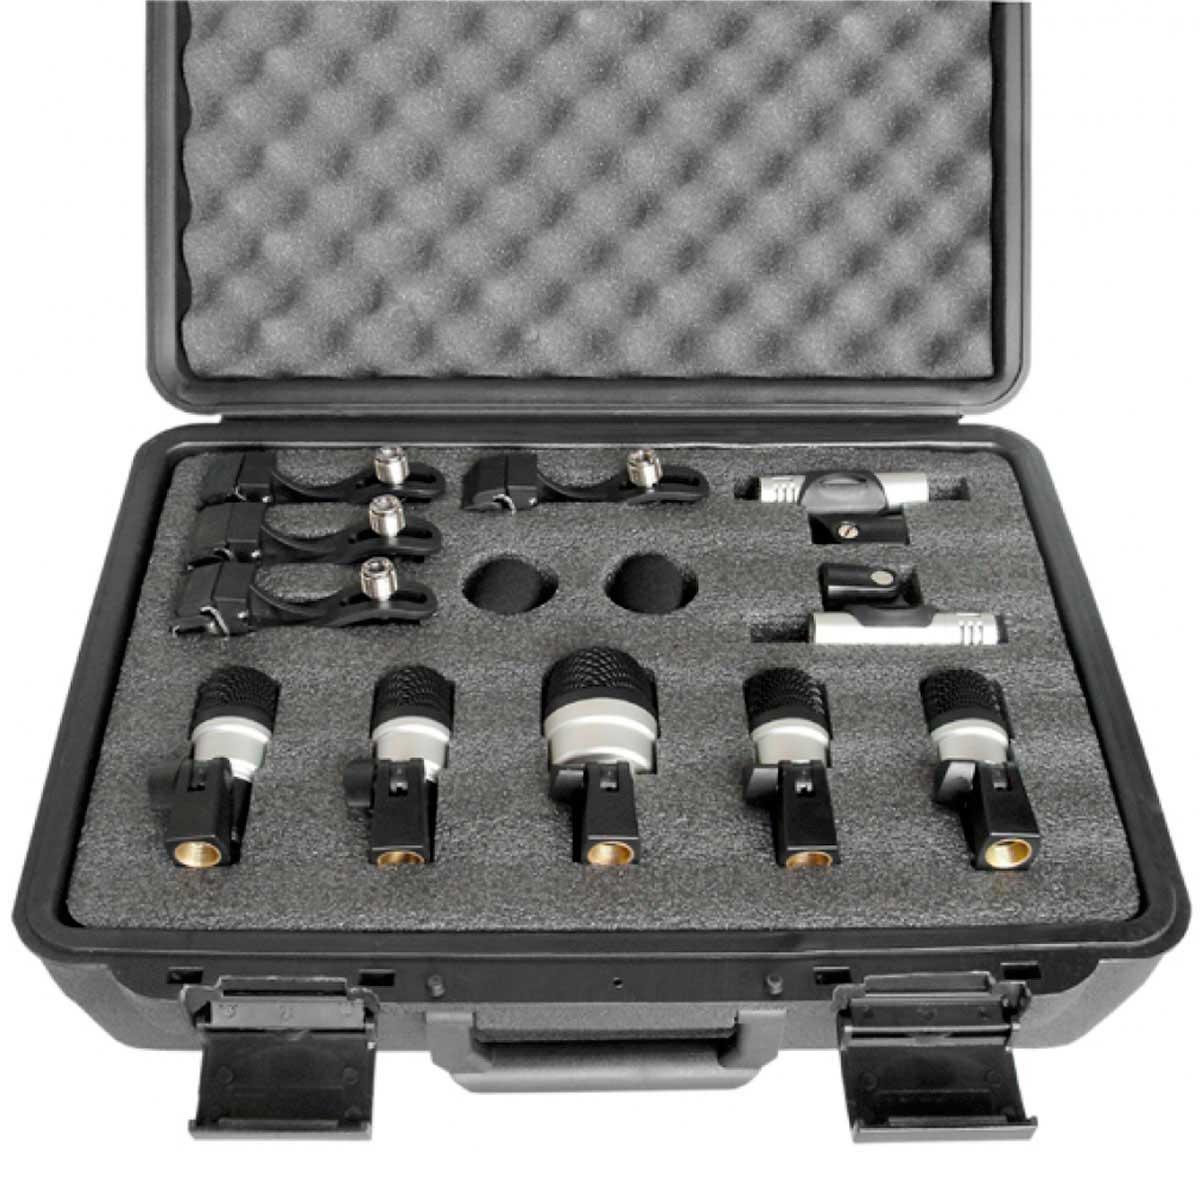 MXDS7 - Kit 7 Microfones c/ Fio p/ Bateria MXDS 7 - Yoga